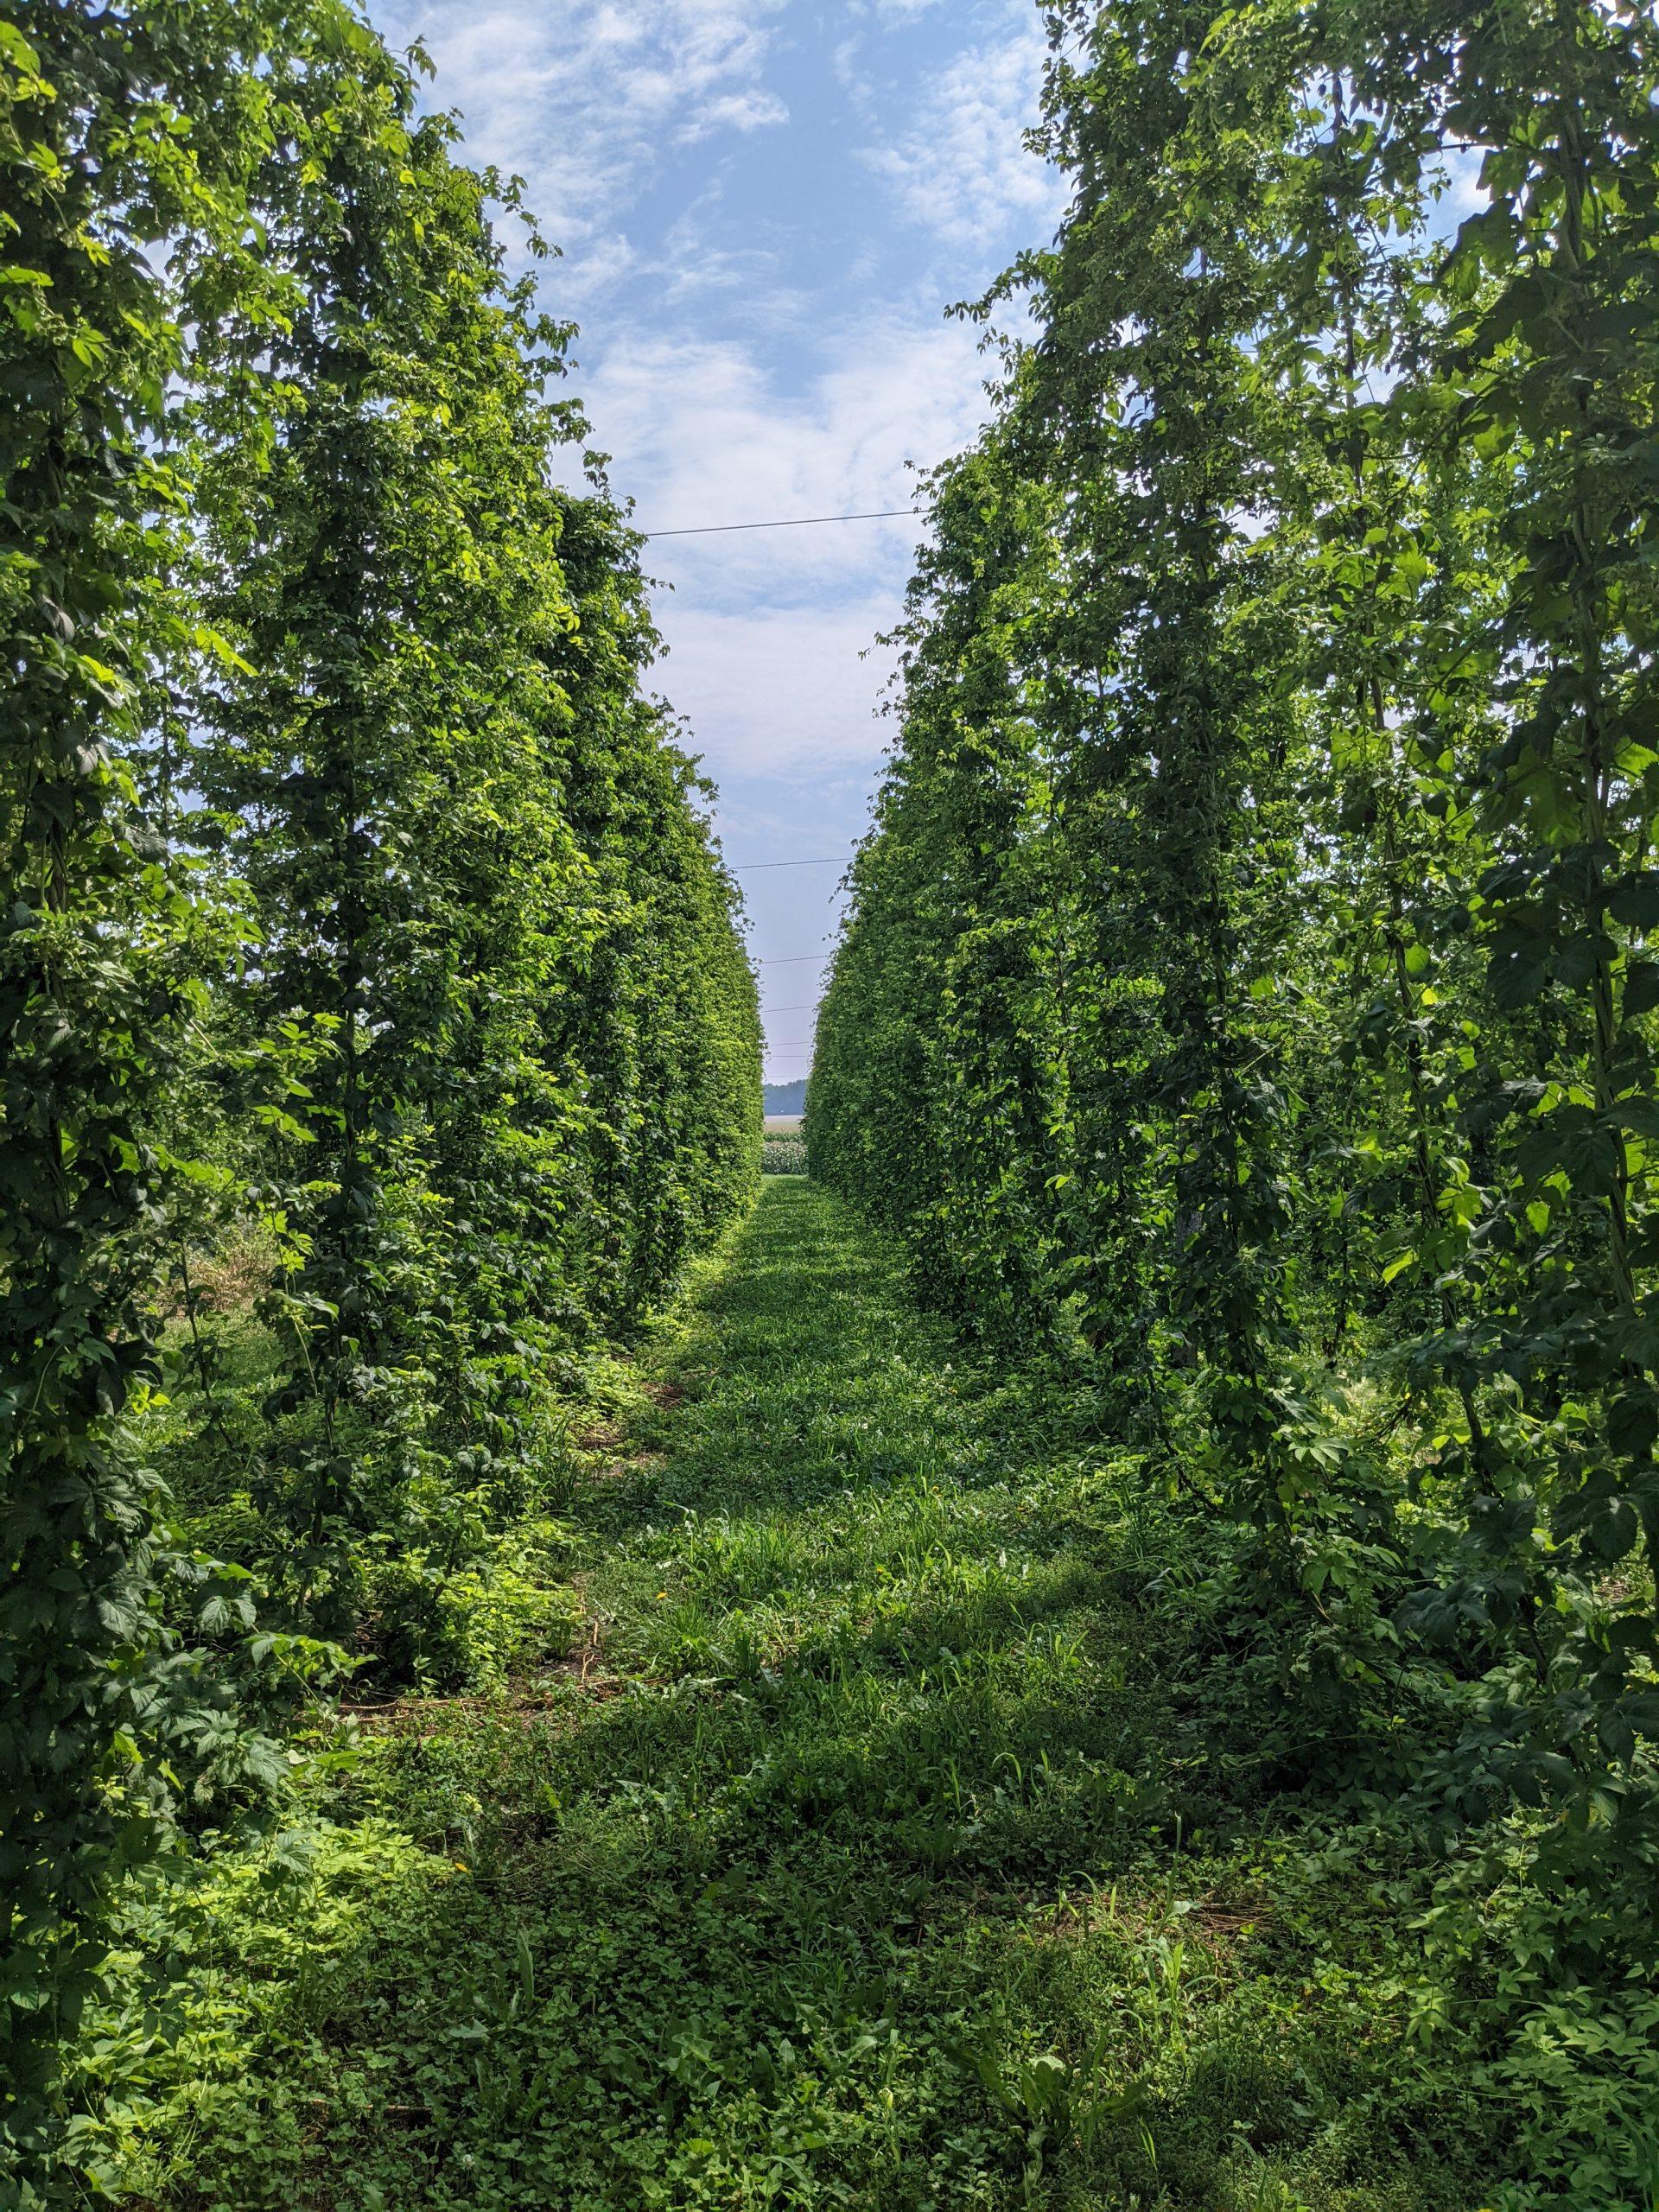 South Dakota Hops Harvest Approaching